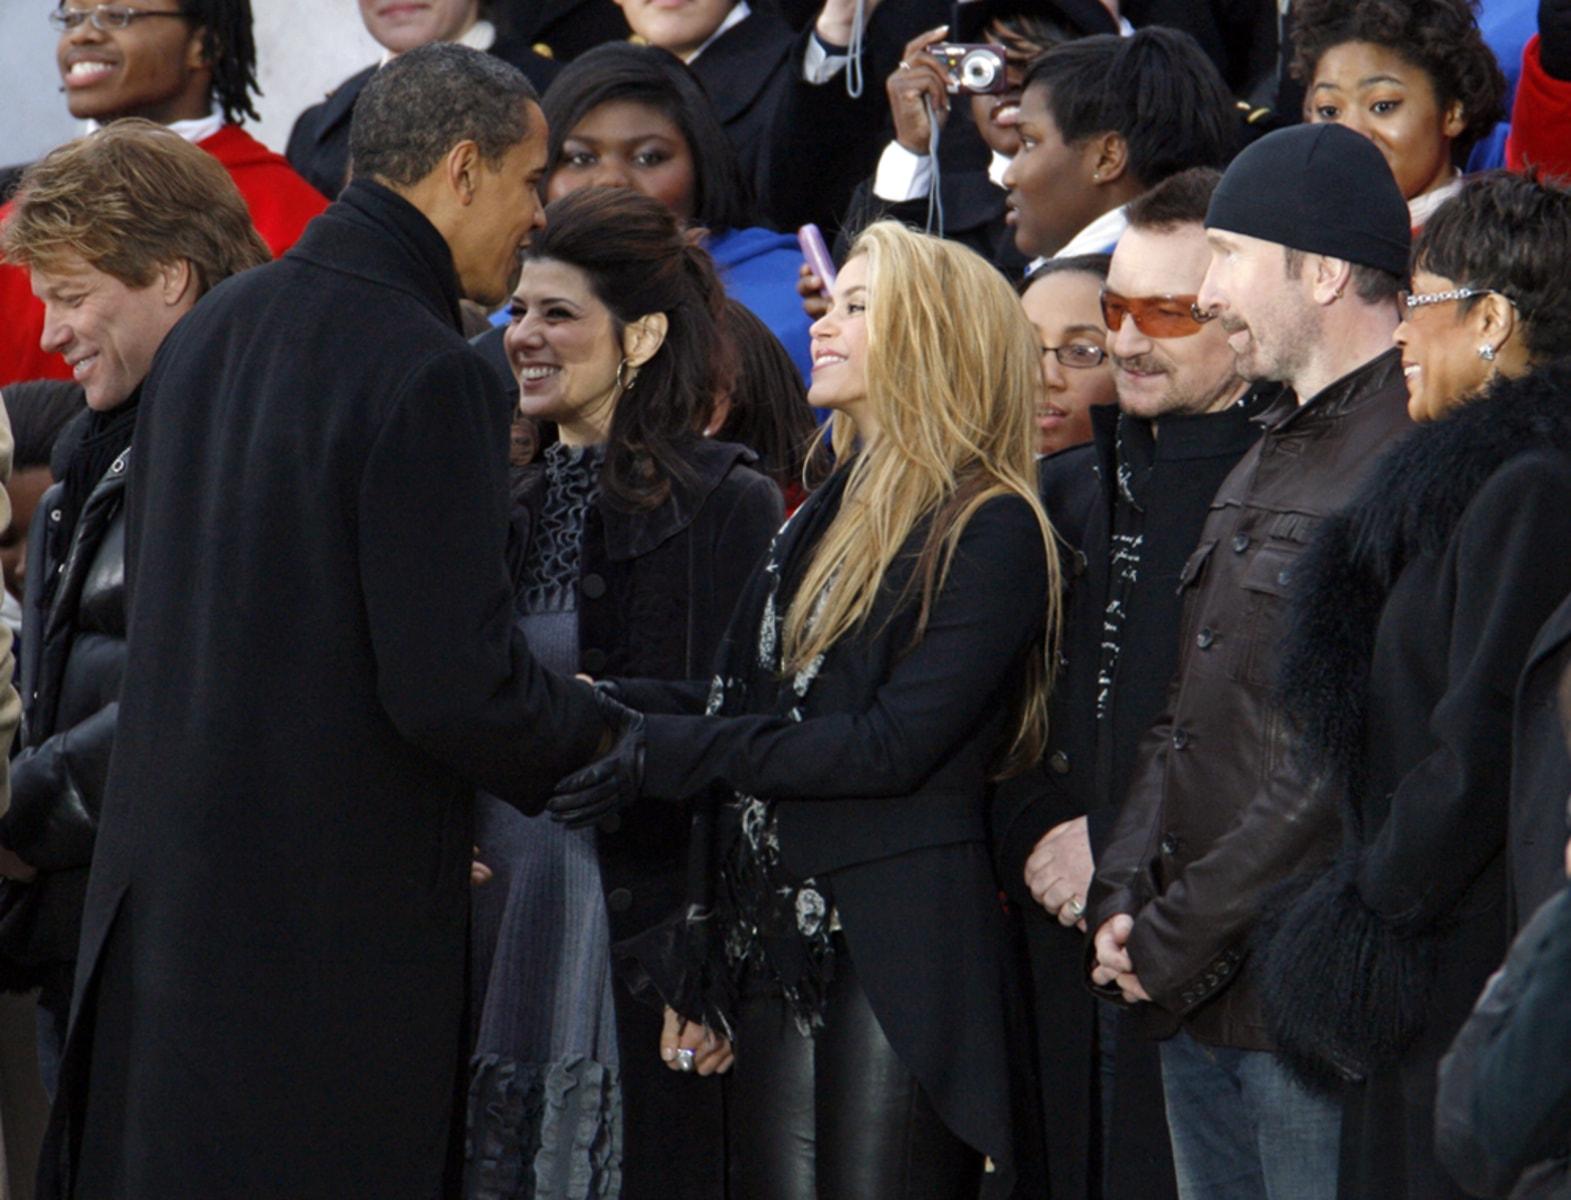 President-elect Obama greets Jon Bon Jovi, Marisa Tomei, Shakira, Bono, The Edge, Bettye Lavette during the We Are One - Opening Inaugural Celebration at the Lincoln Memorial in Washington